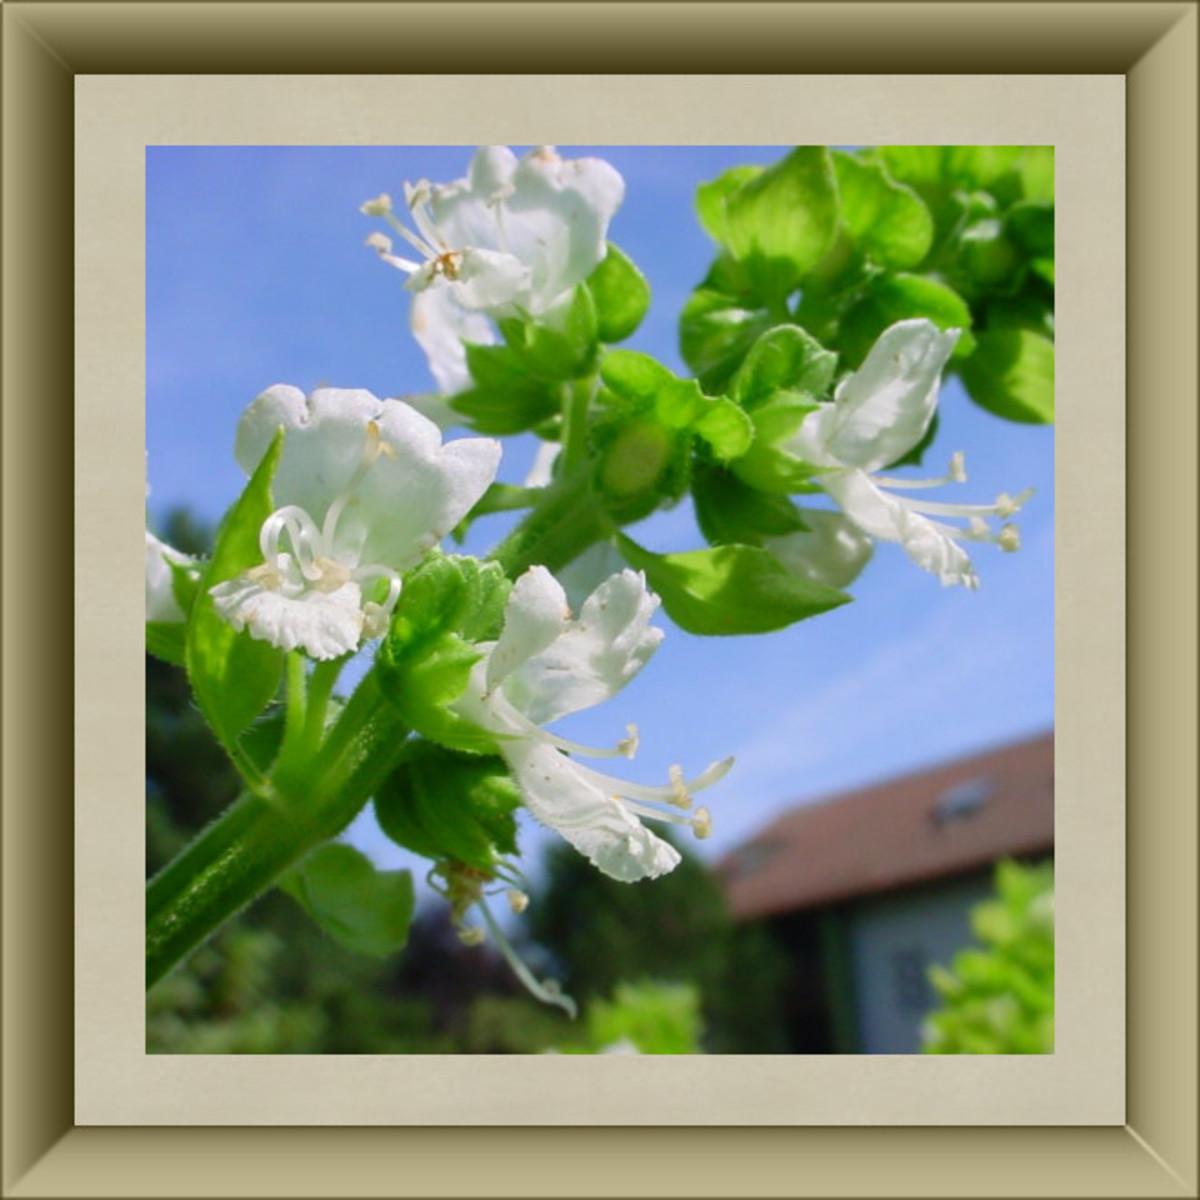 Basil Blossoms